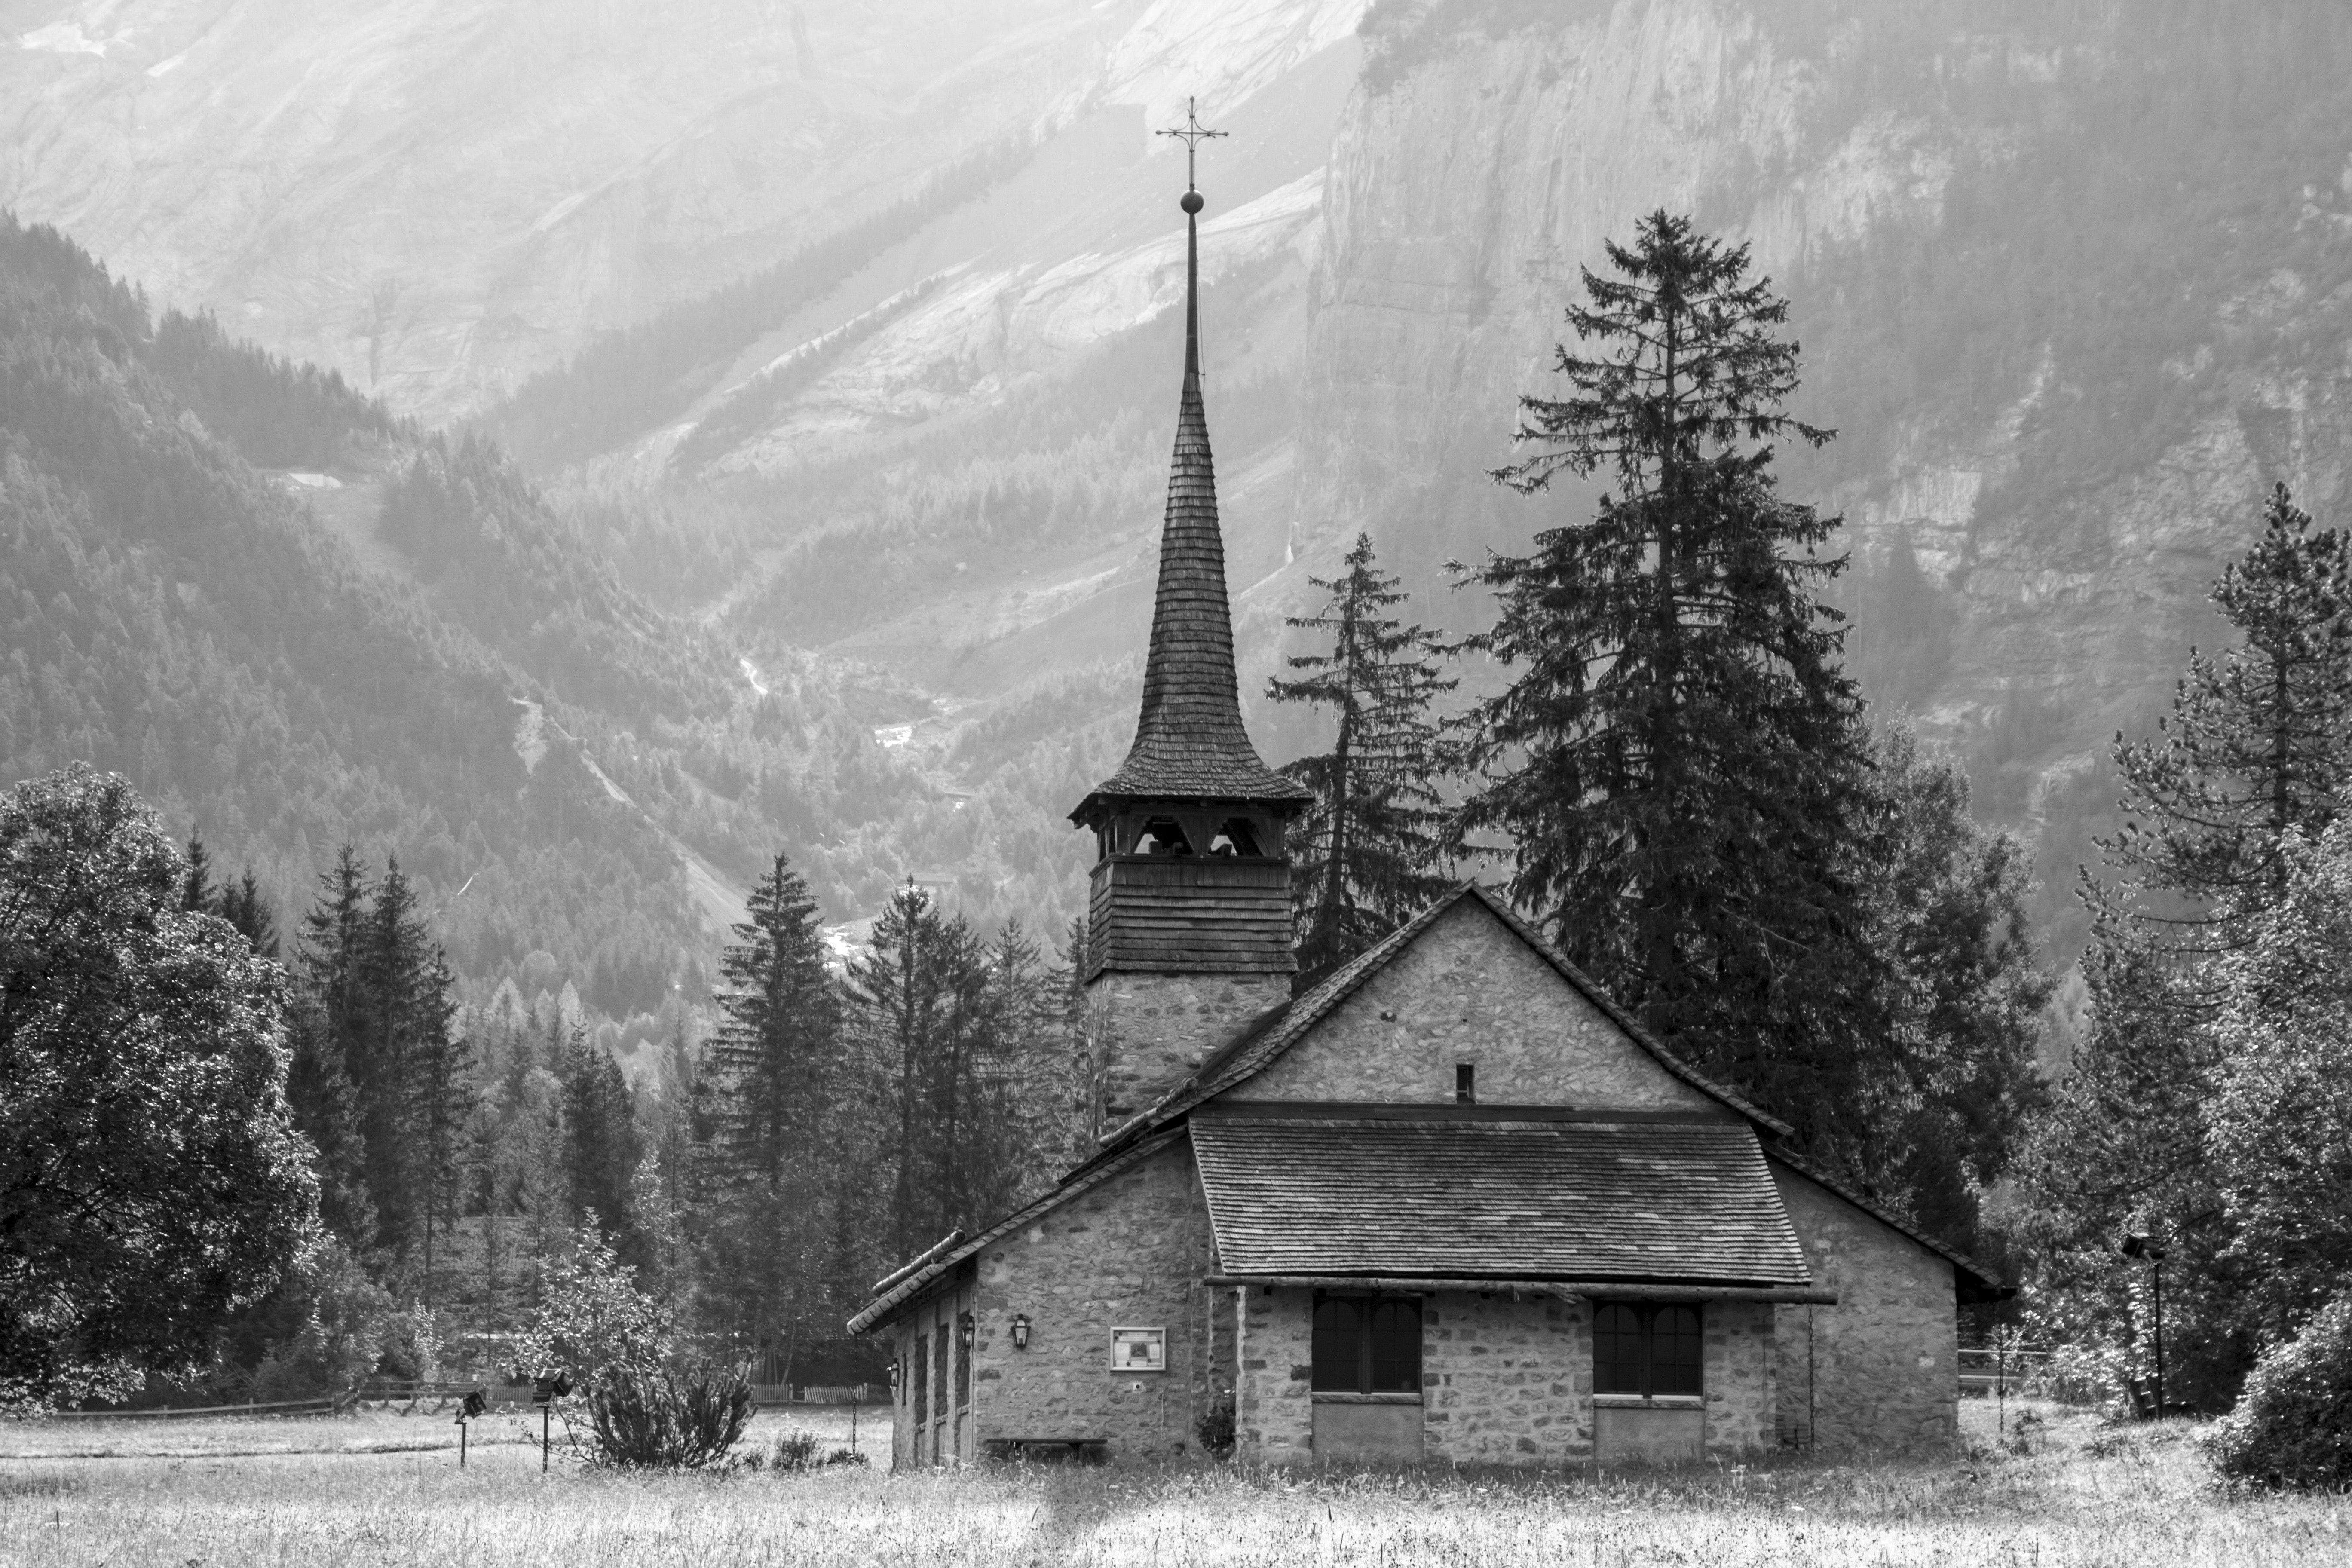 Church in the Open Field Near the Mountain, Black-and-white, Chapel, Church, Fog, HQ Photo